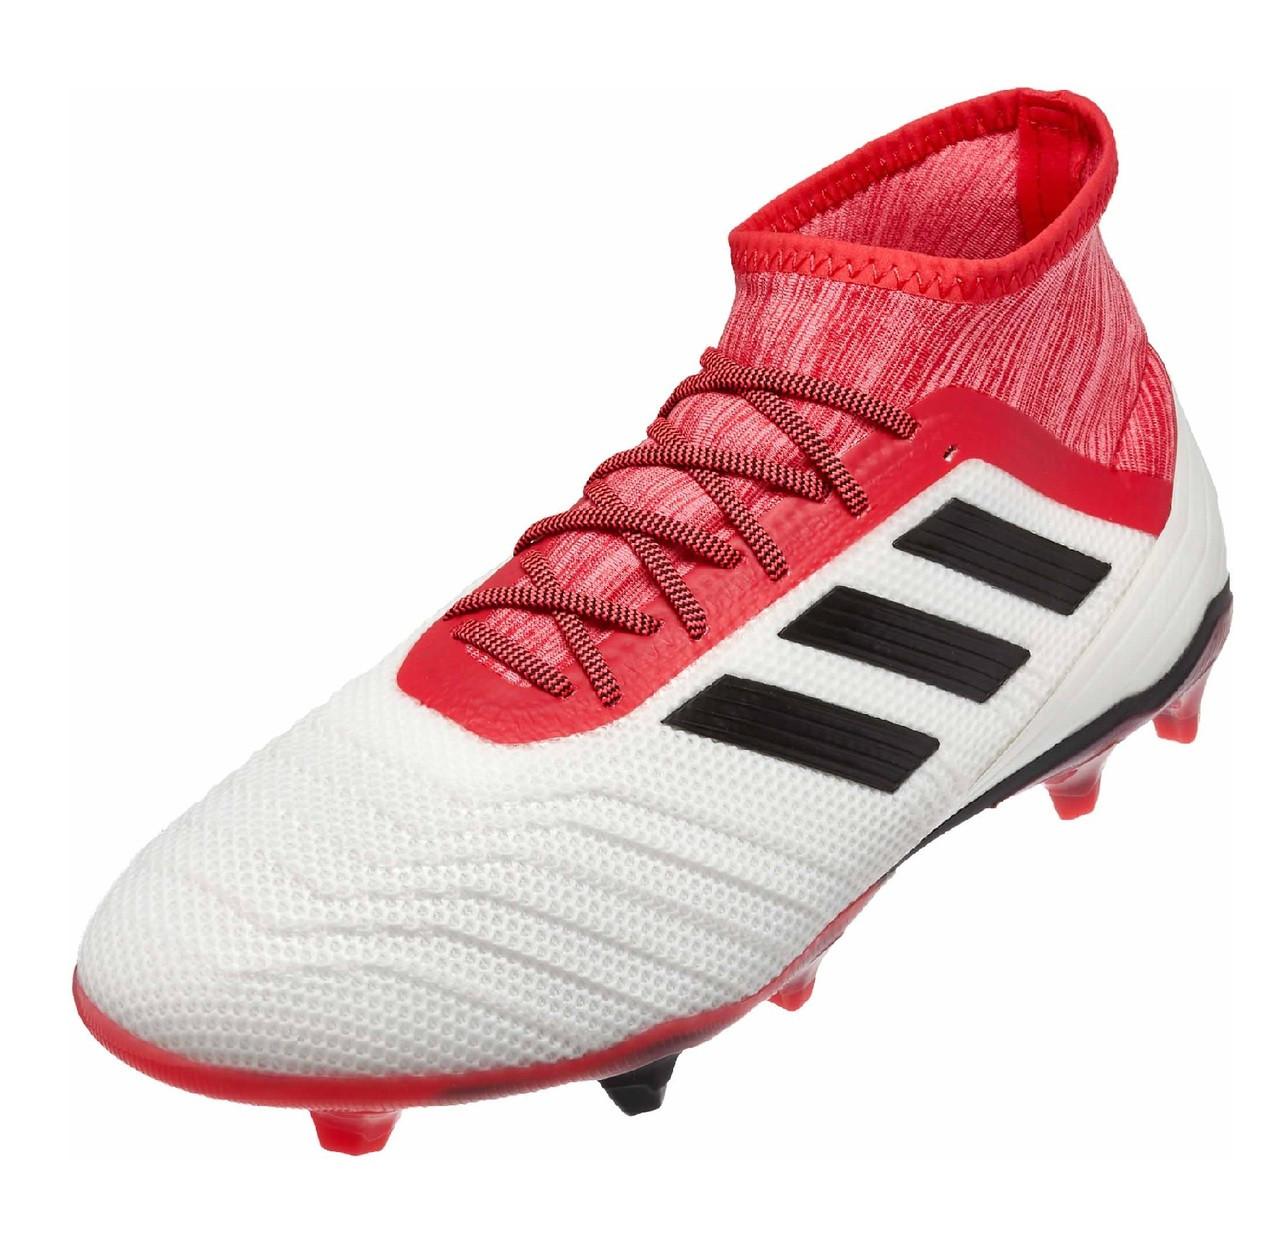 2b99f2a89 Adidas Predator 18.2 FG - White Core Black Real Coral (2518) - ohp soccer